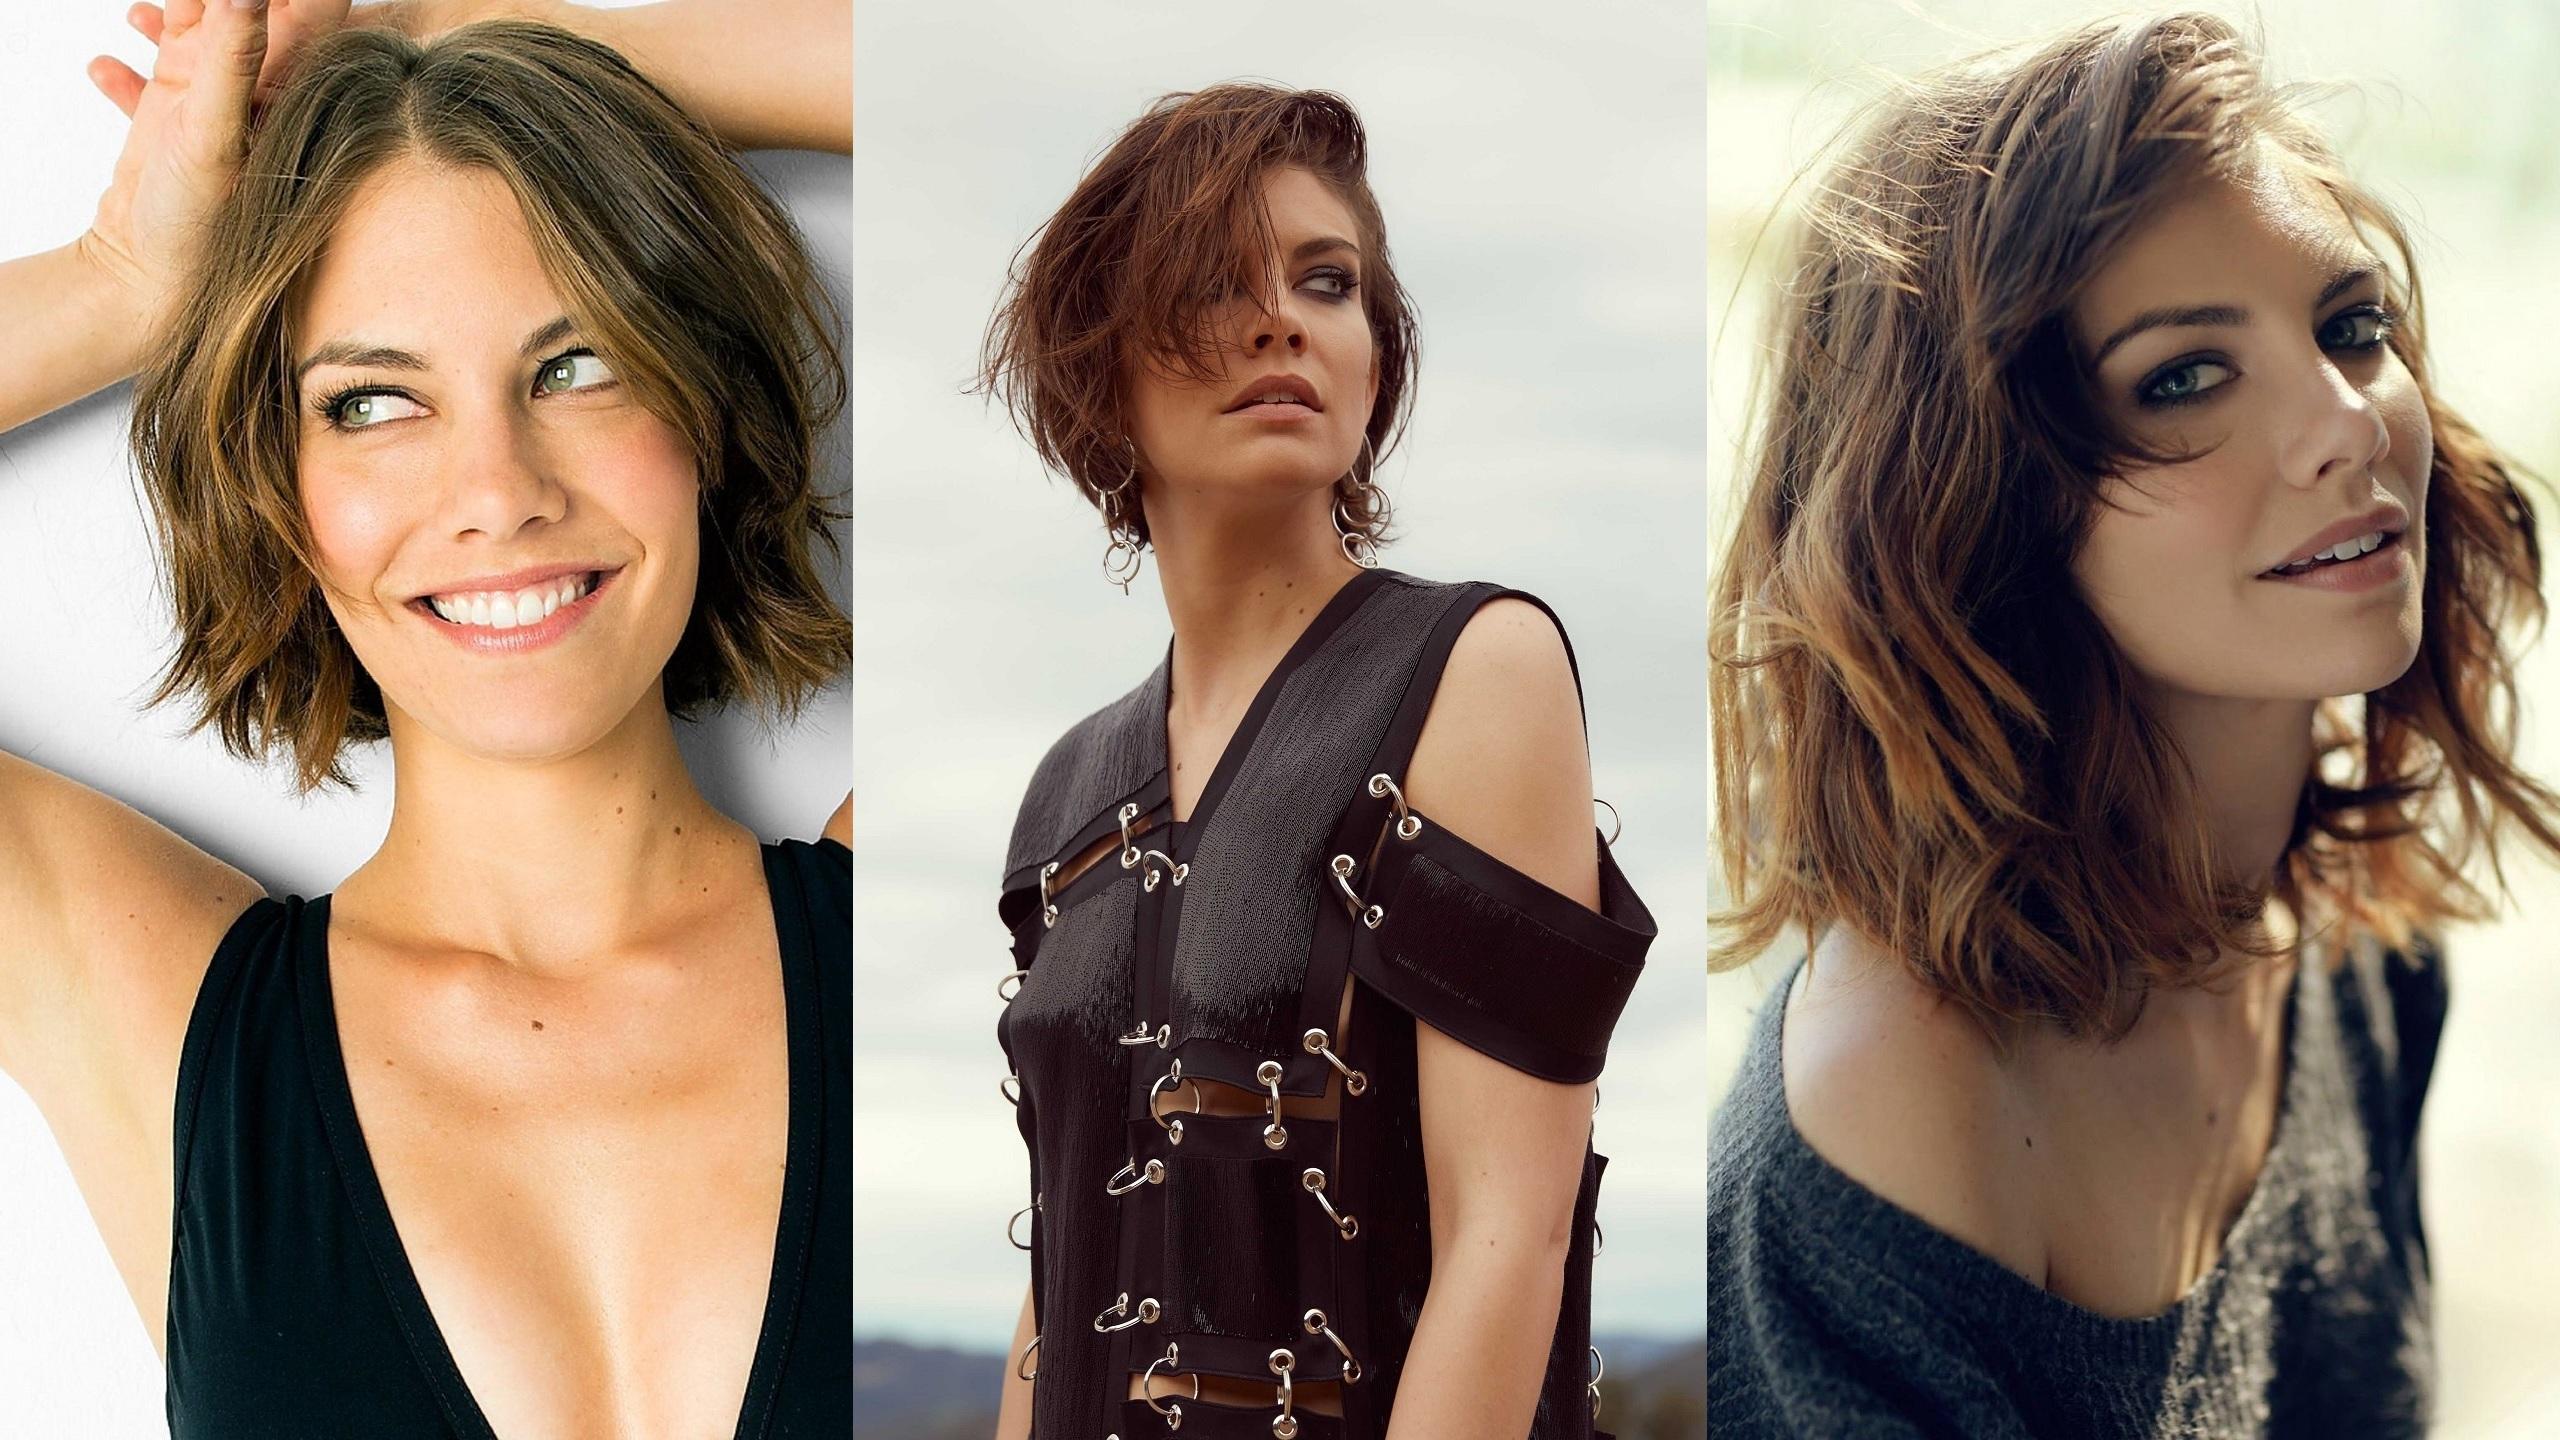 Wallpaper Lauren Cohan Actress Brunette Looking At Viewer Green Eyes Short Hair Collage 2560x1440 Harleypool1450 1221468 Hd Wallpapers Wallhere